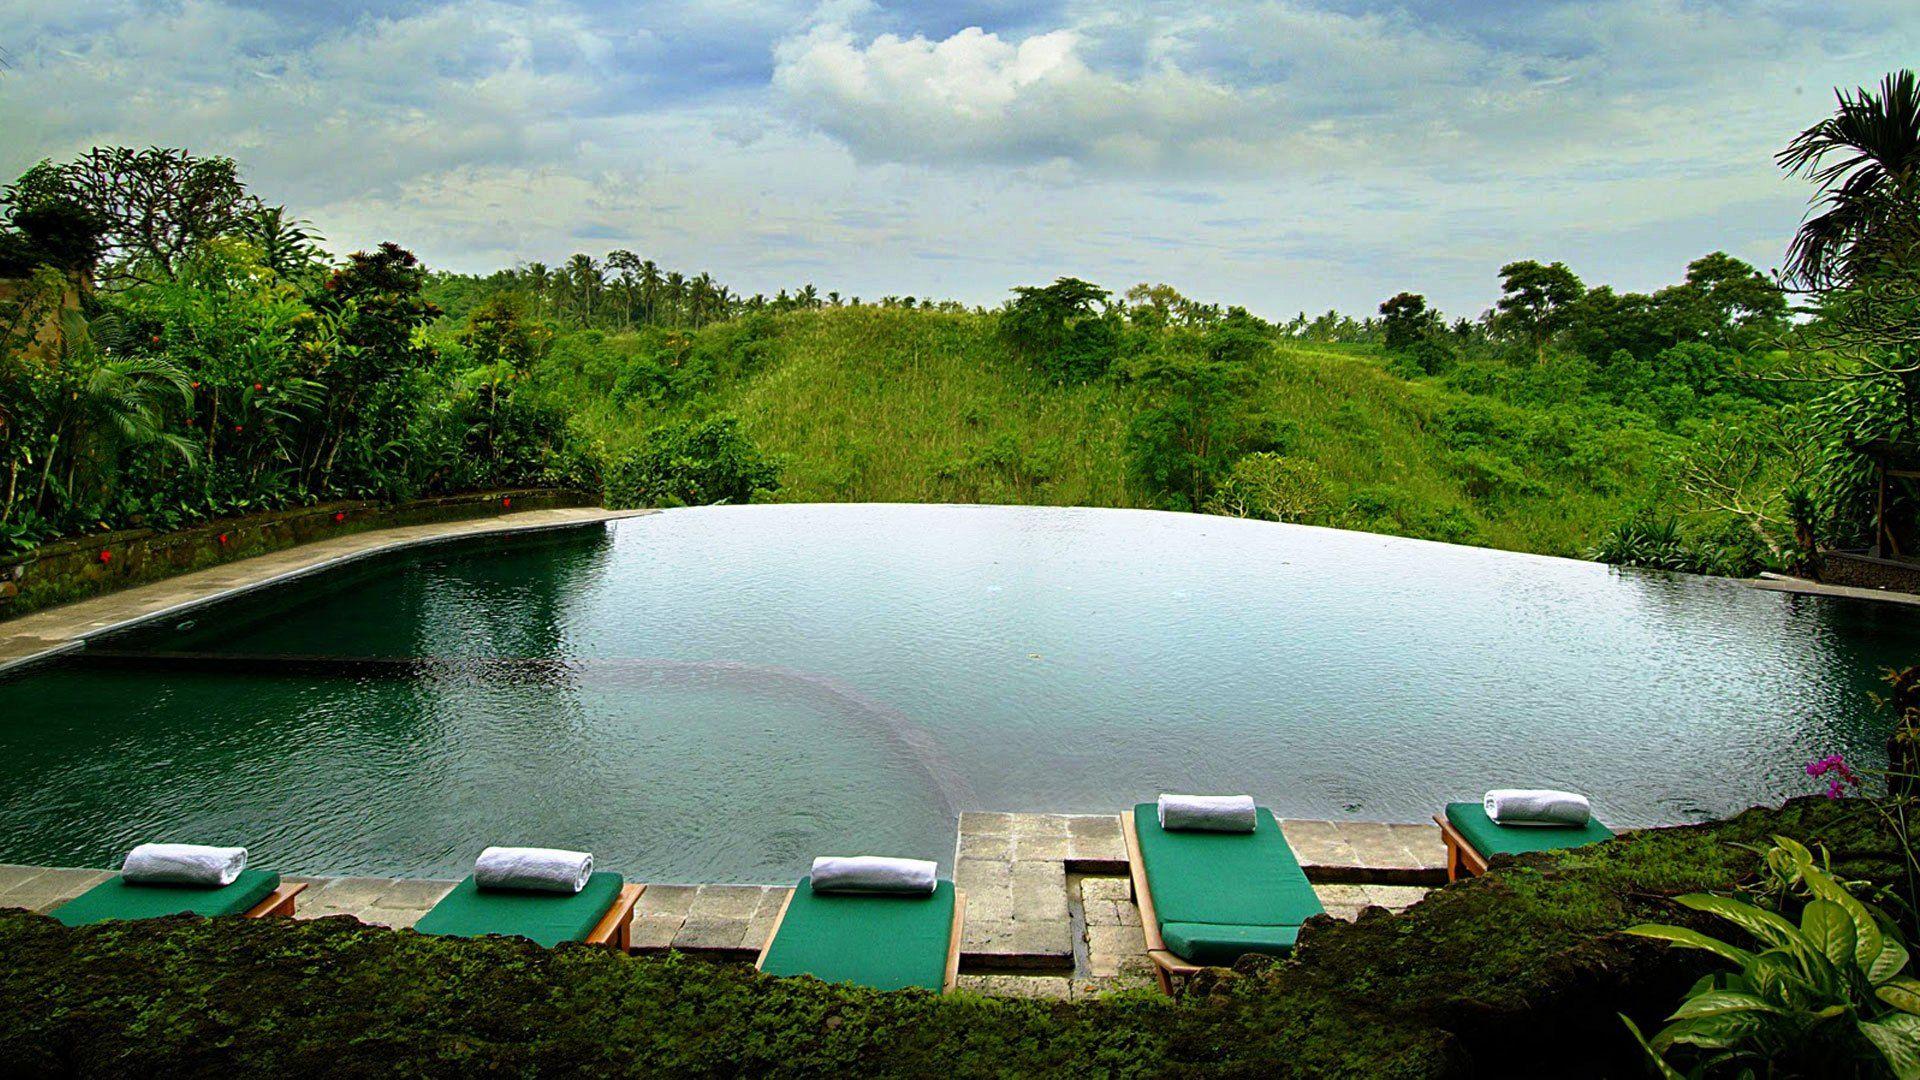 Overlooking stunning greens #Hanging GardensHotel in #Ubud #Bali ...